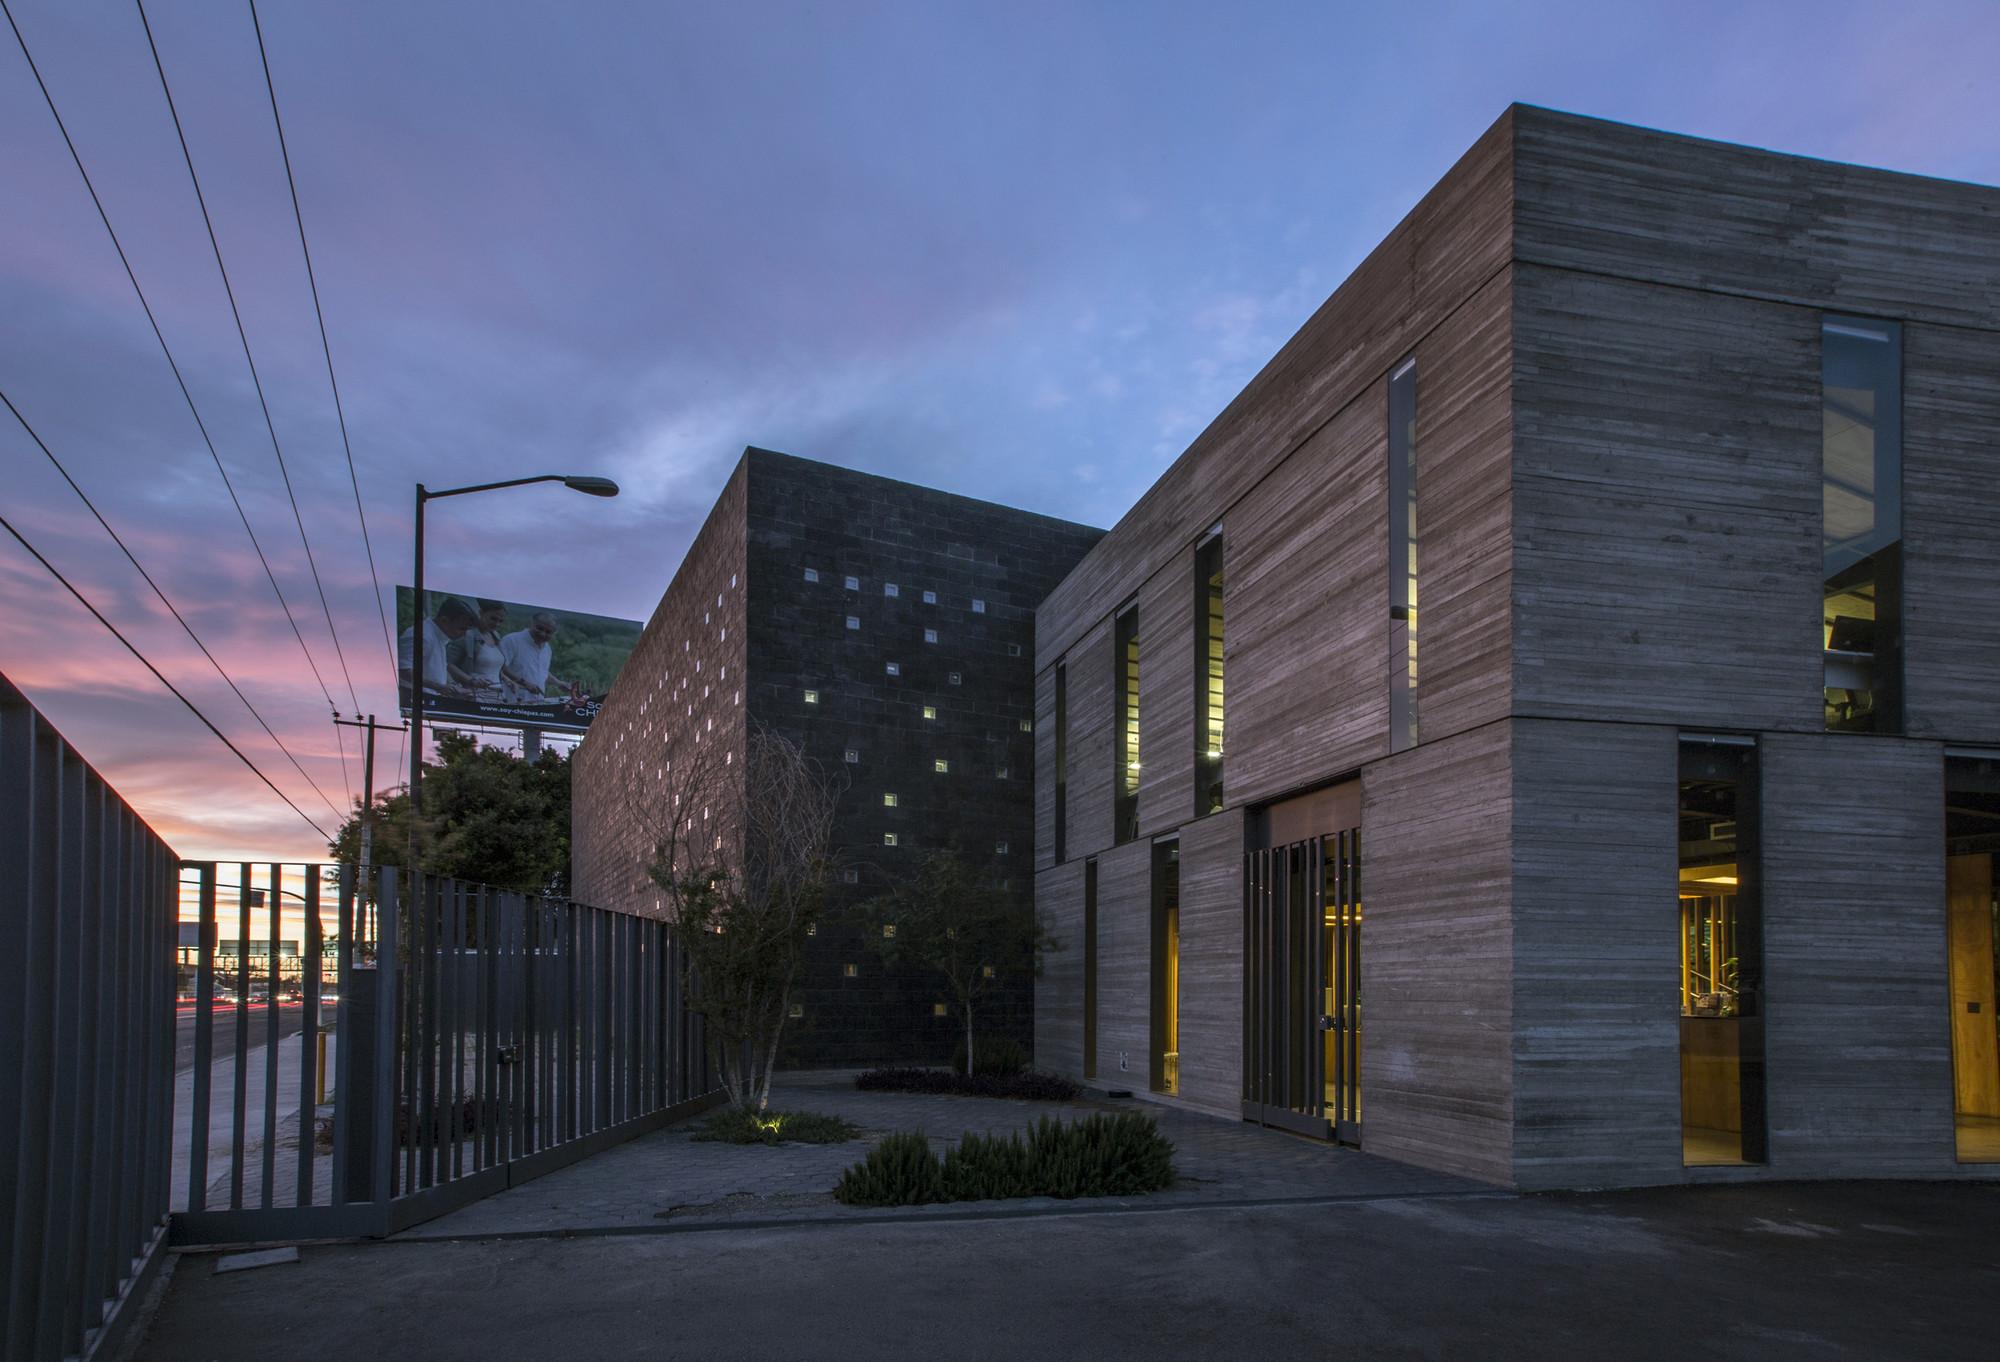 Tesistan Warehouse / CoA arquitectura + Estudio Macias Peredo, © Daniel Robles